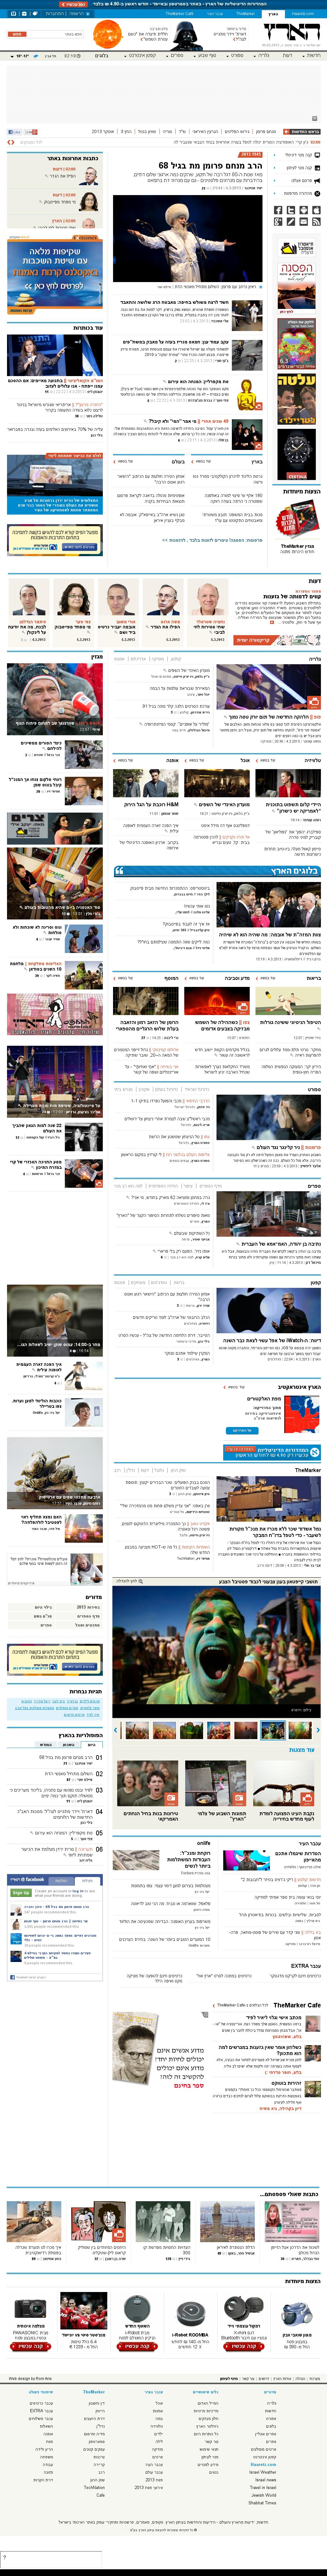 Haaretz at Tuesday March 5, 2013, 12:10 a.m. UTC